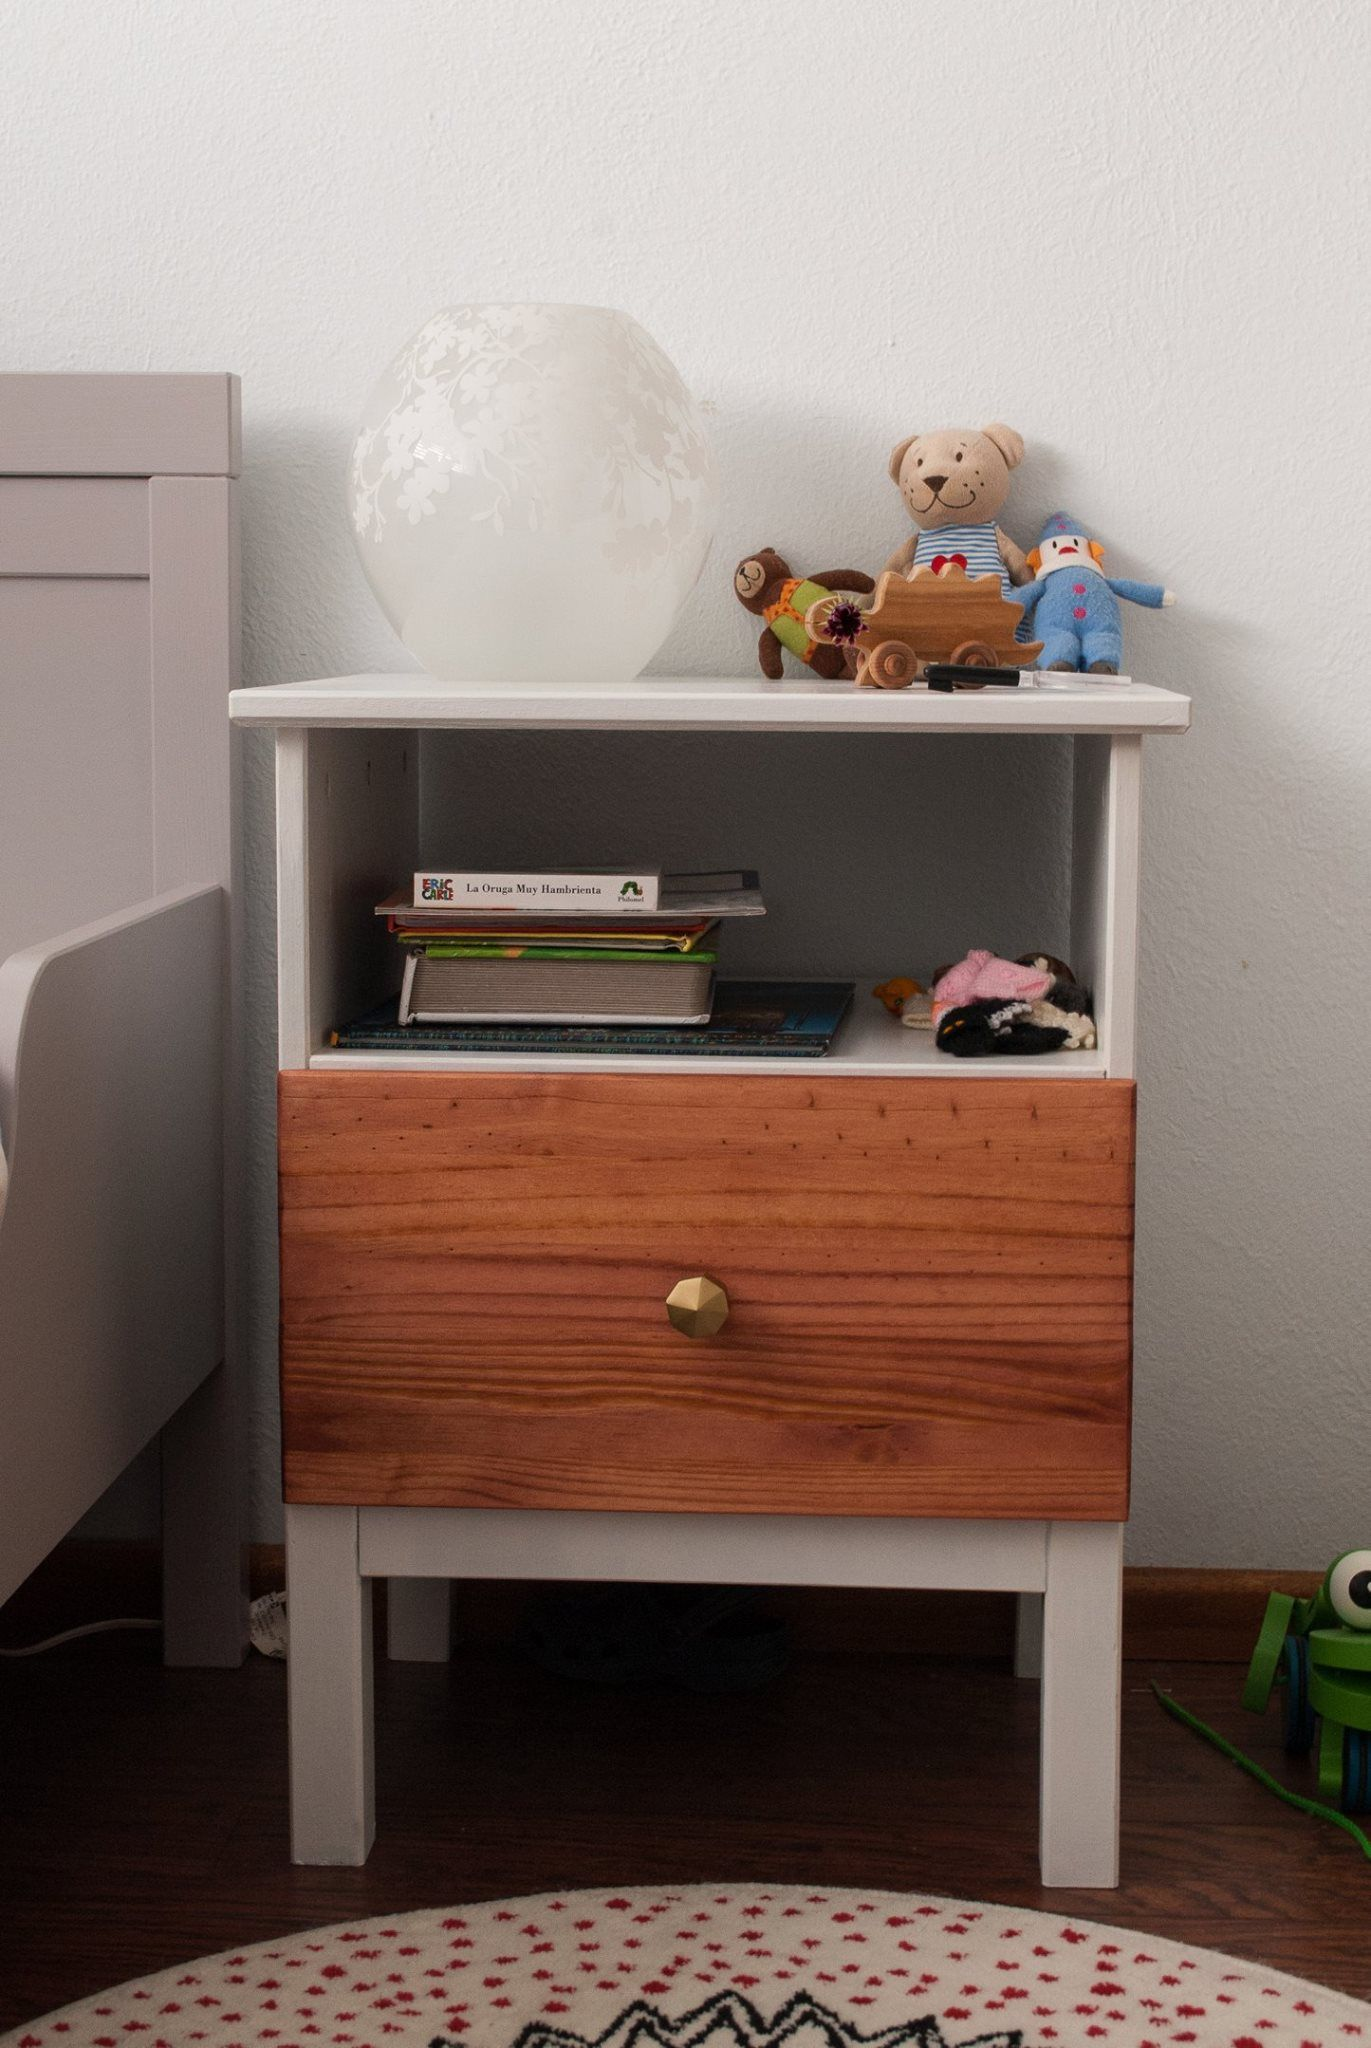 Ikea Tarva nightstand hack Home diy, Ikea nightstand